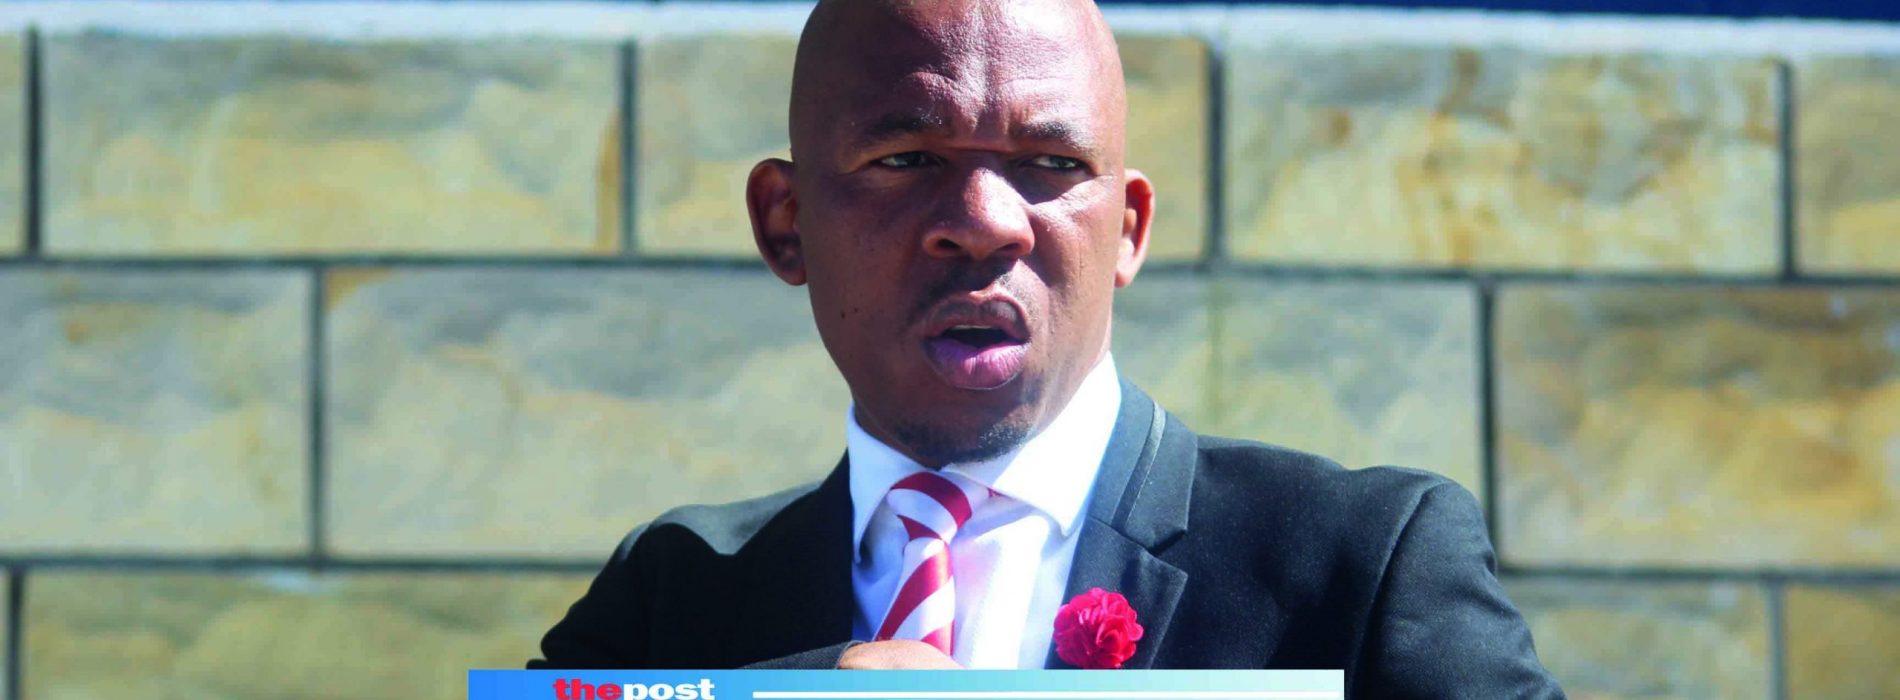 MP attacks minister